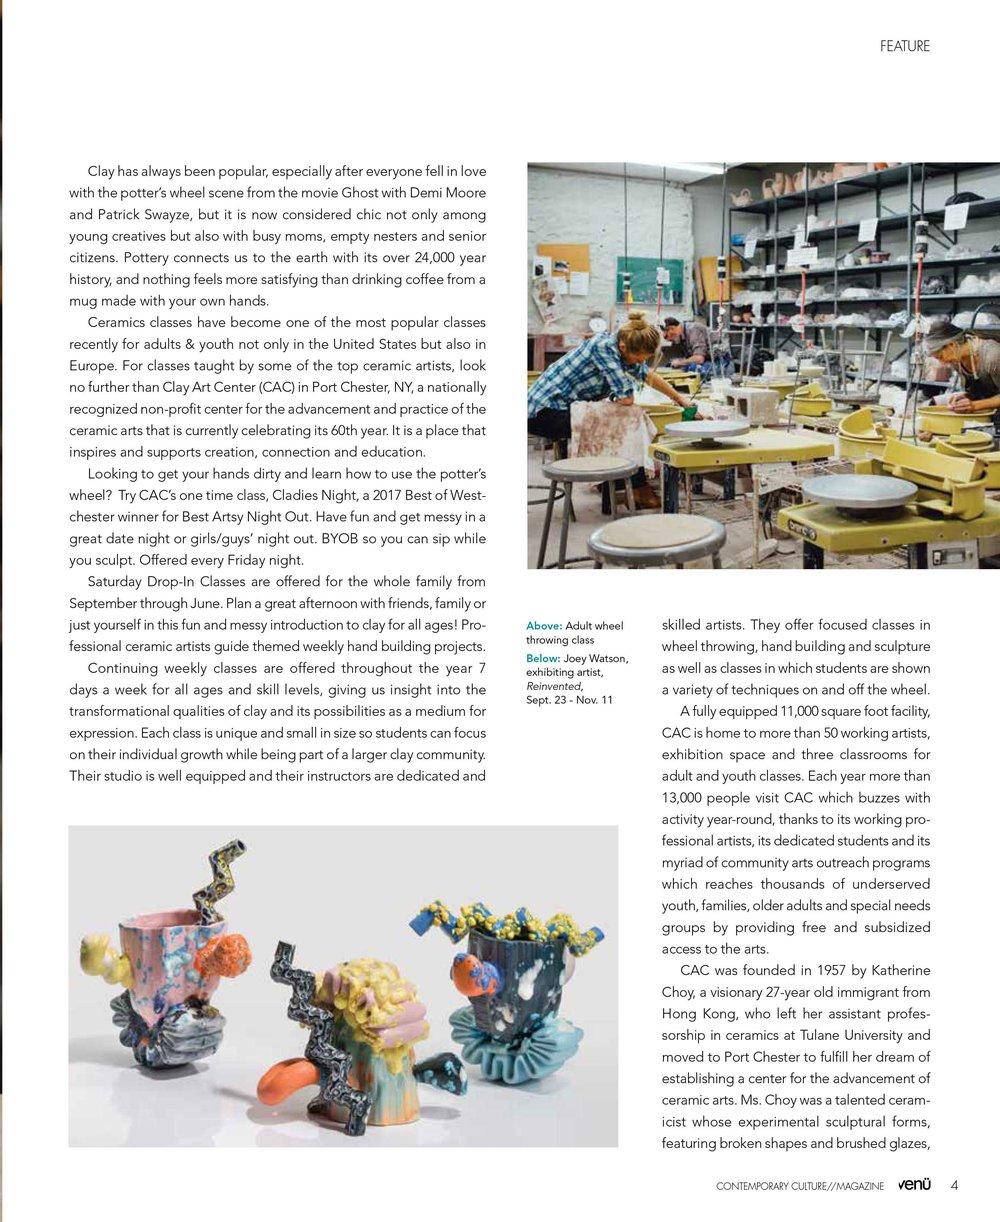 Clay Art Center Venu Magazine Feature Fall 2017-page 4.jpg